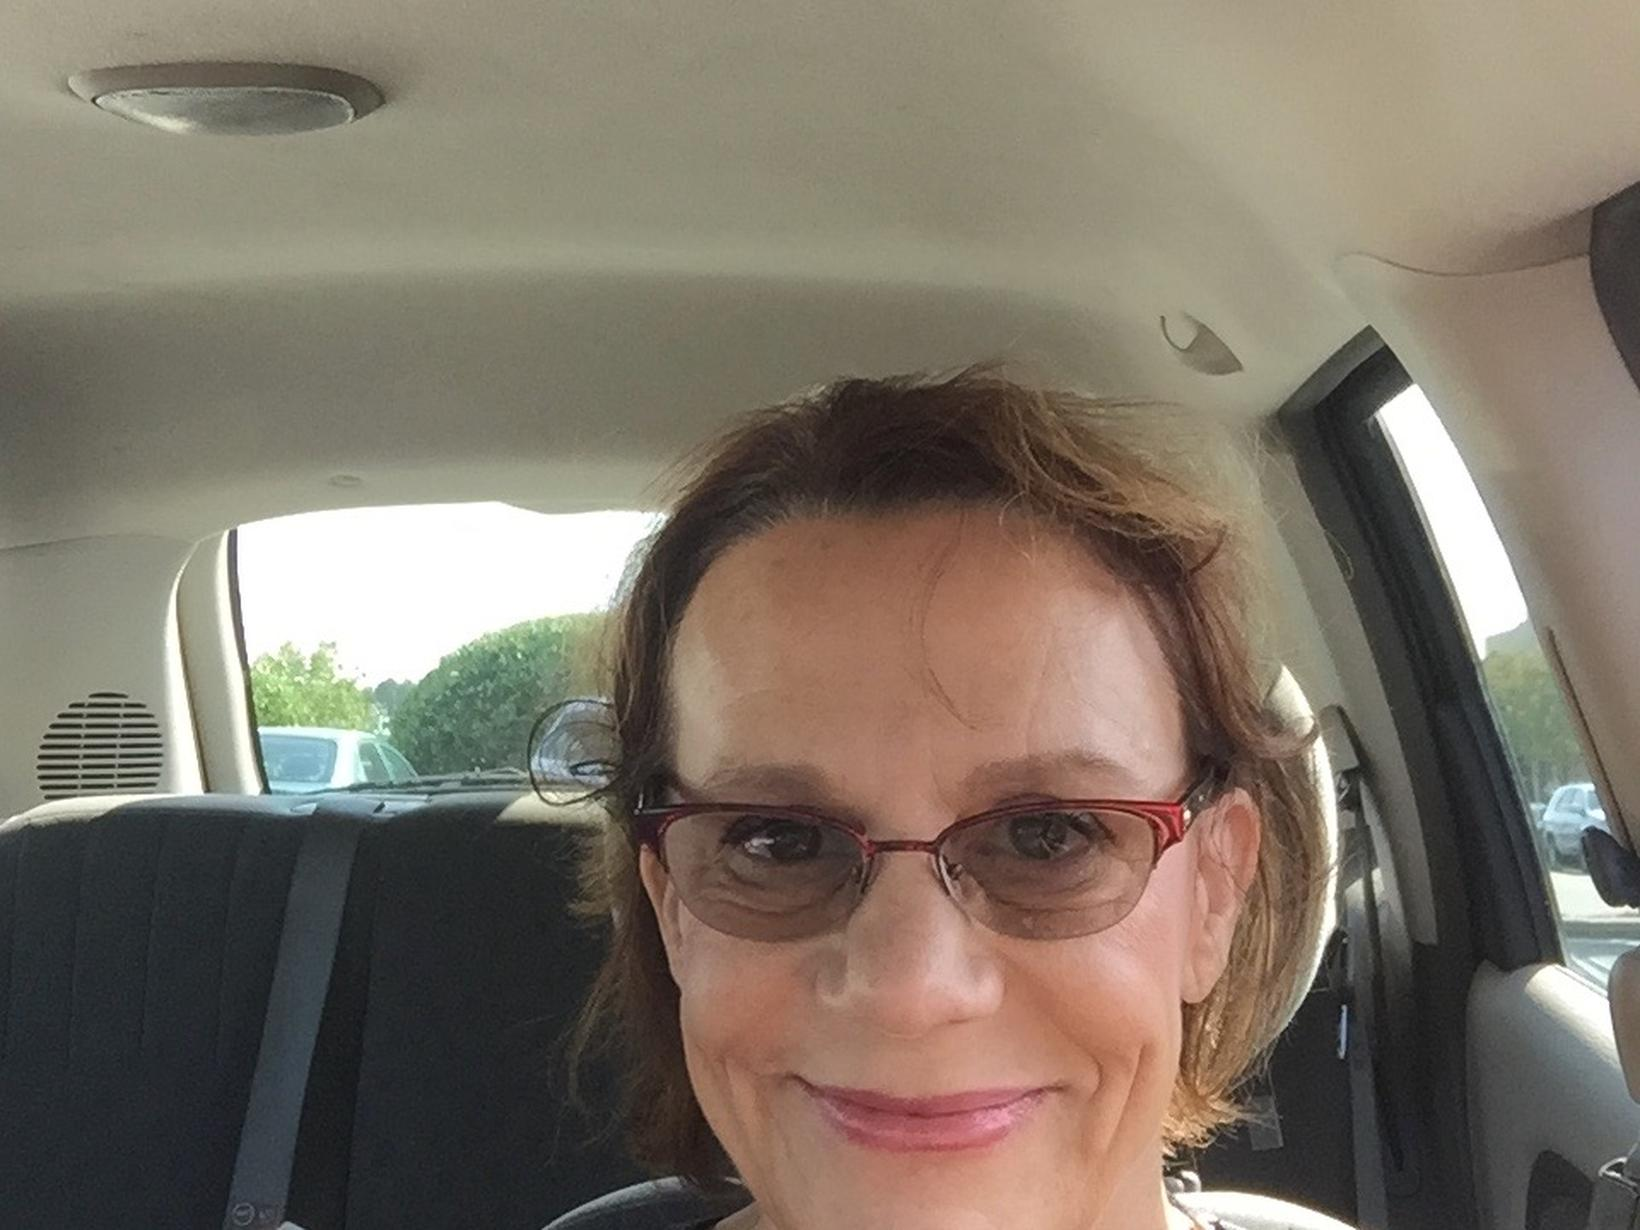 Jillian from Chapel Hill, North Carolina, United States